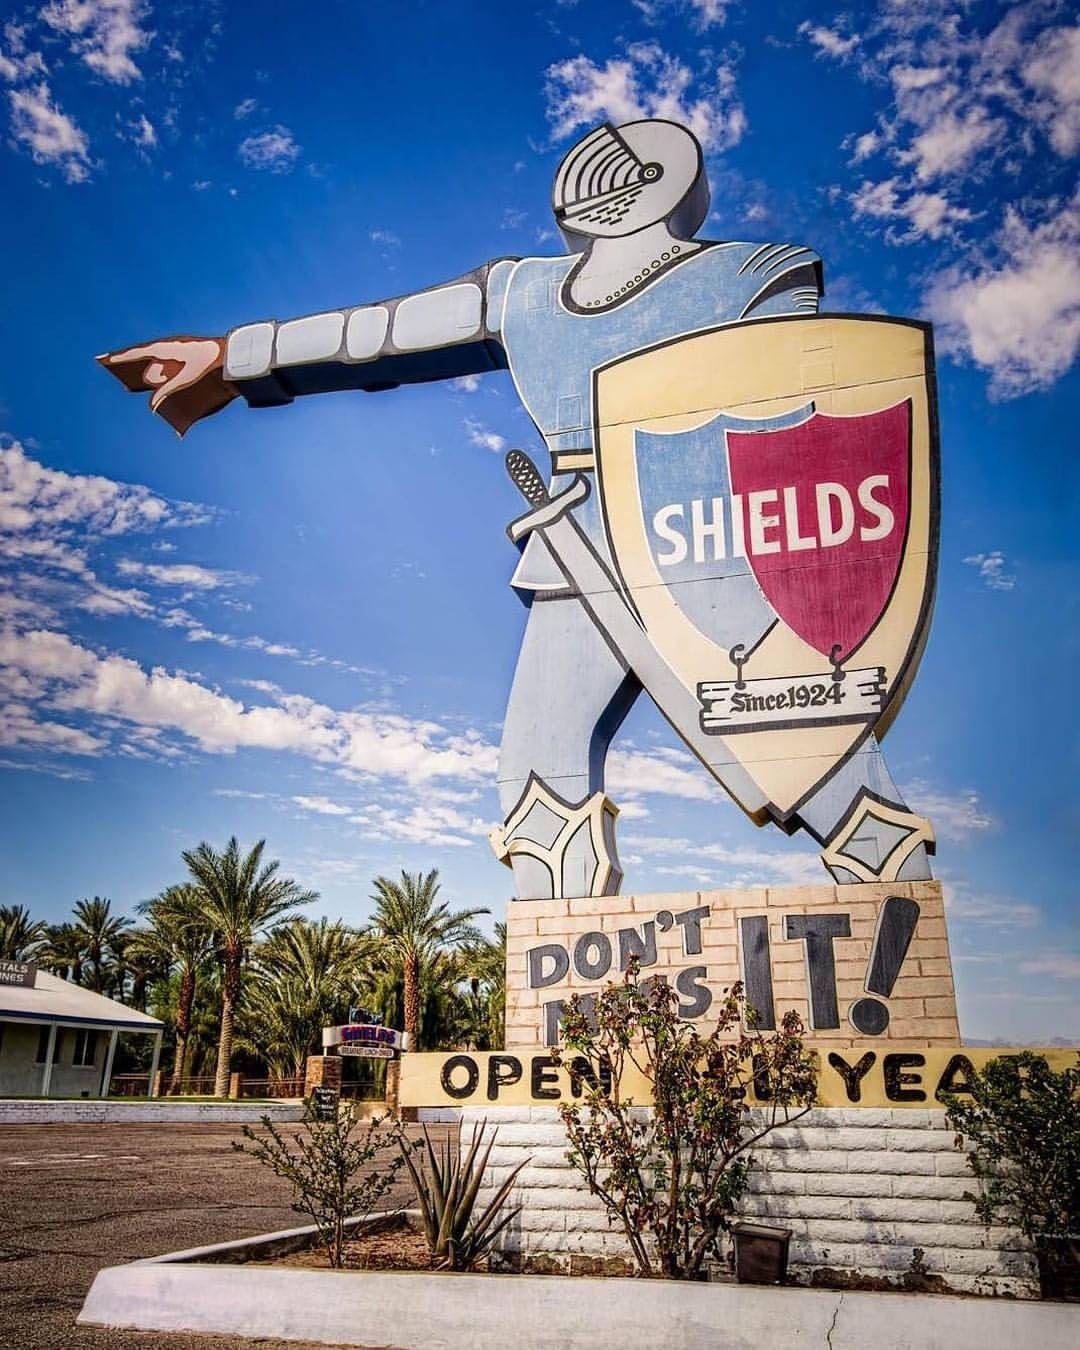 shields date garden - Shields Date Garden